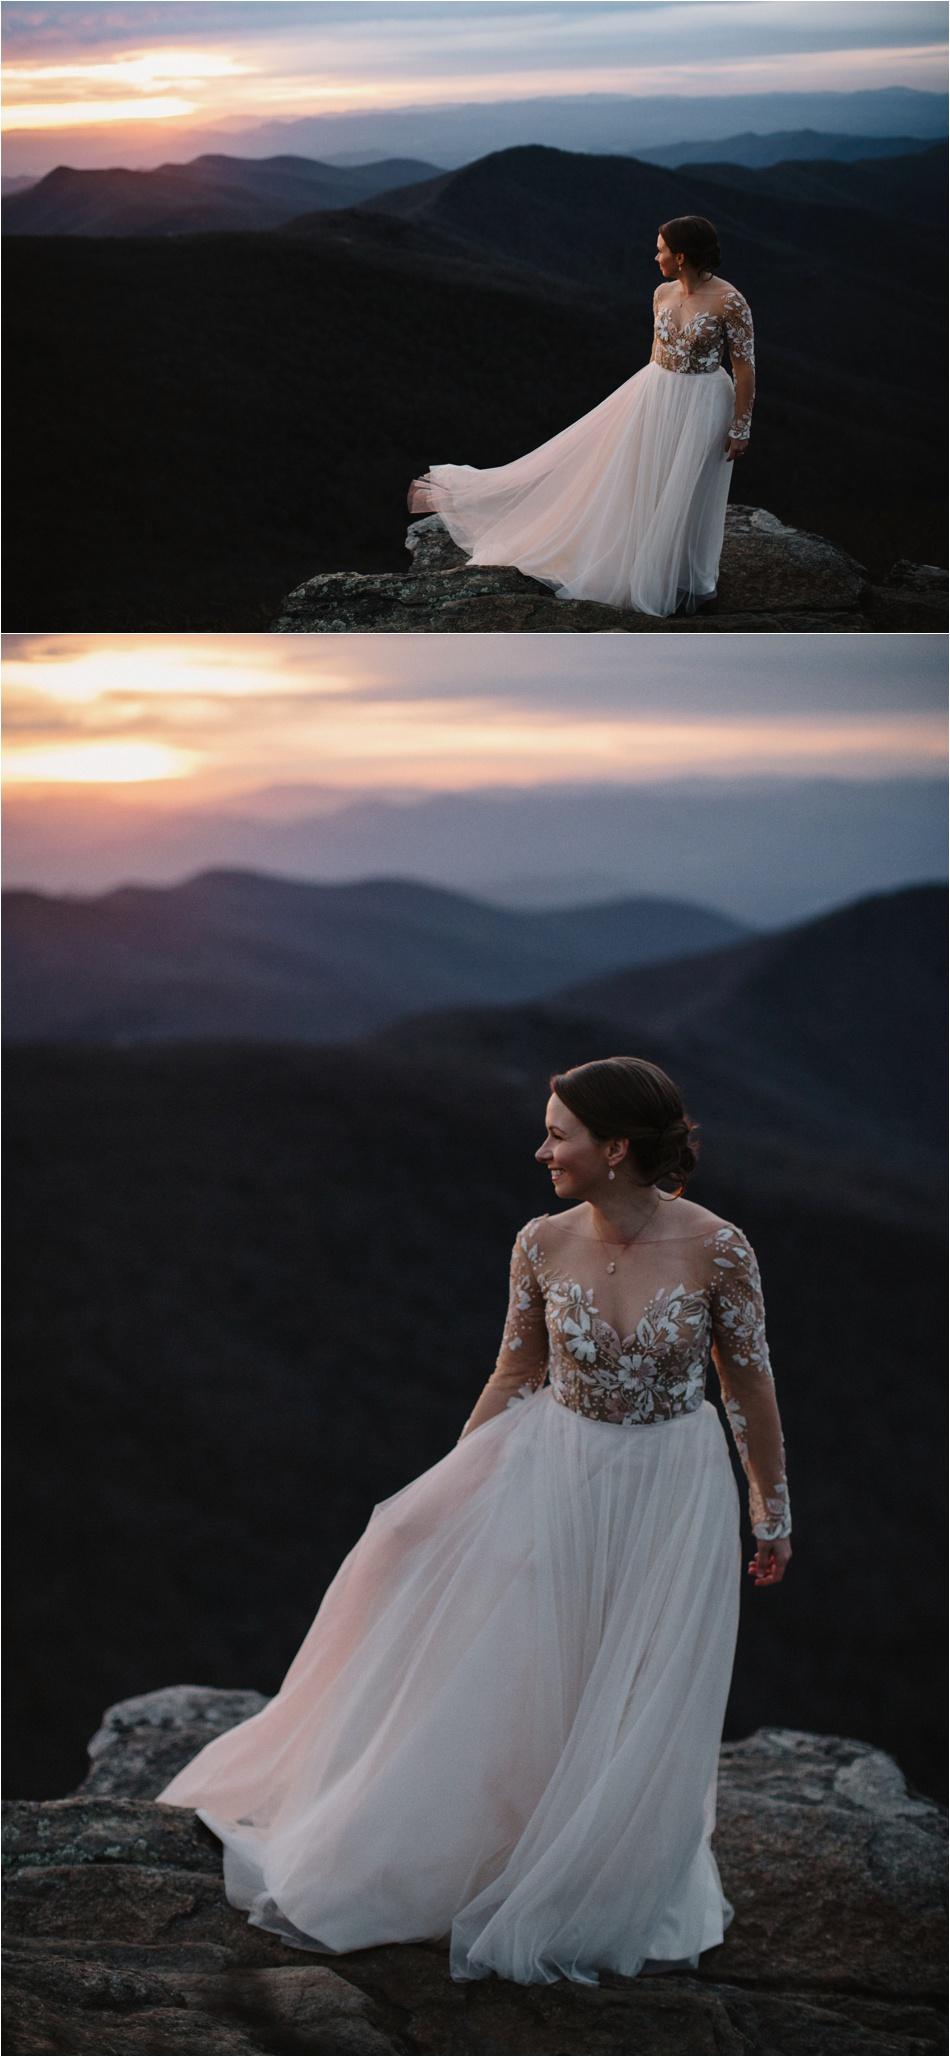 craggy-asheville-elopement-michelle-carl68.jpg